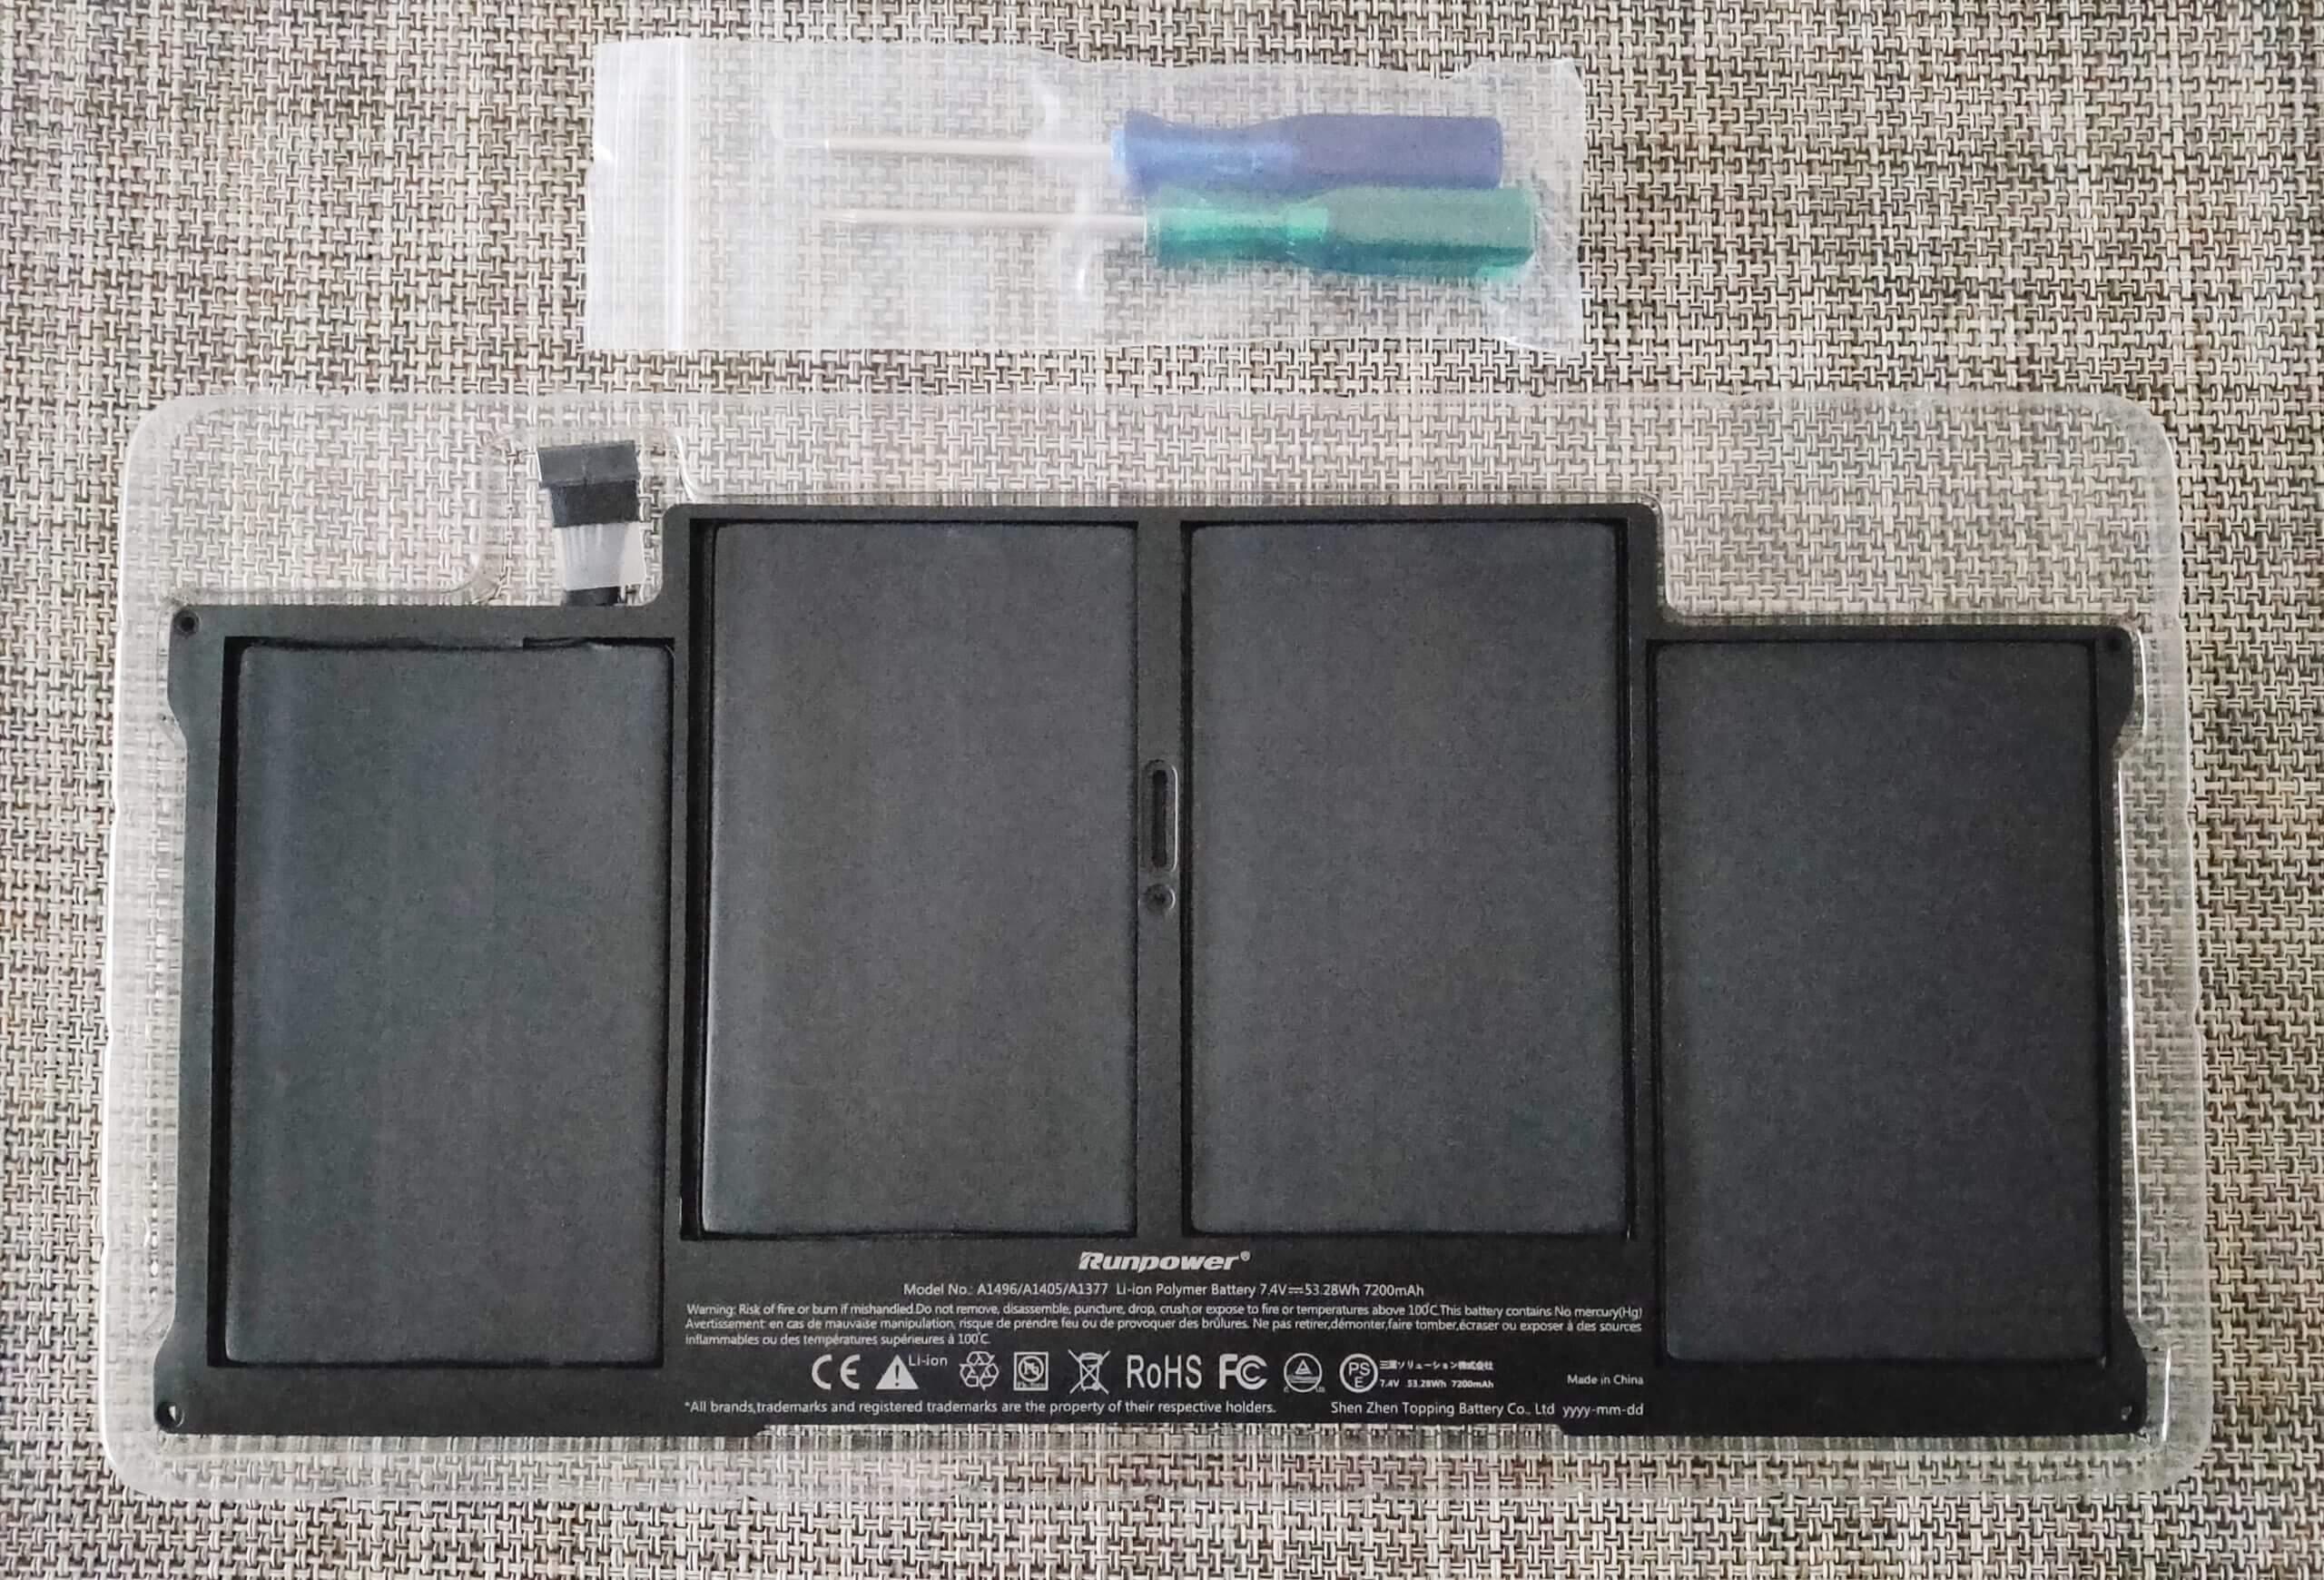 MacBookaAirバッテリー交換を自分でやる手順 バッテリーを取り寄せる